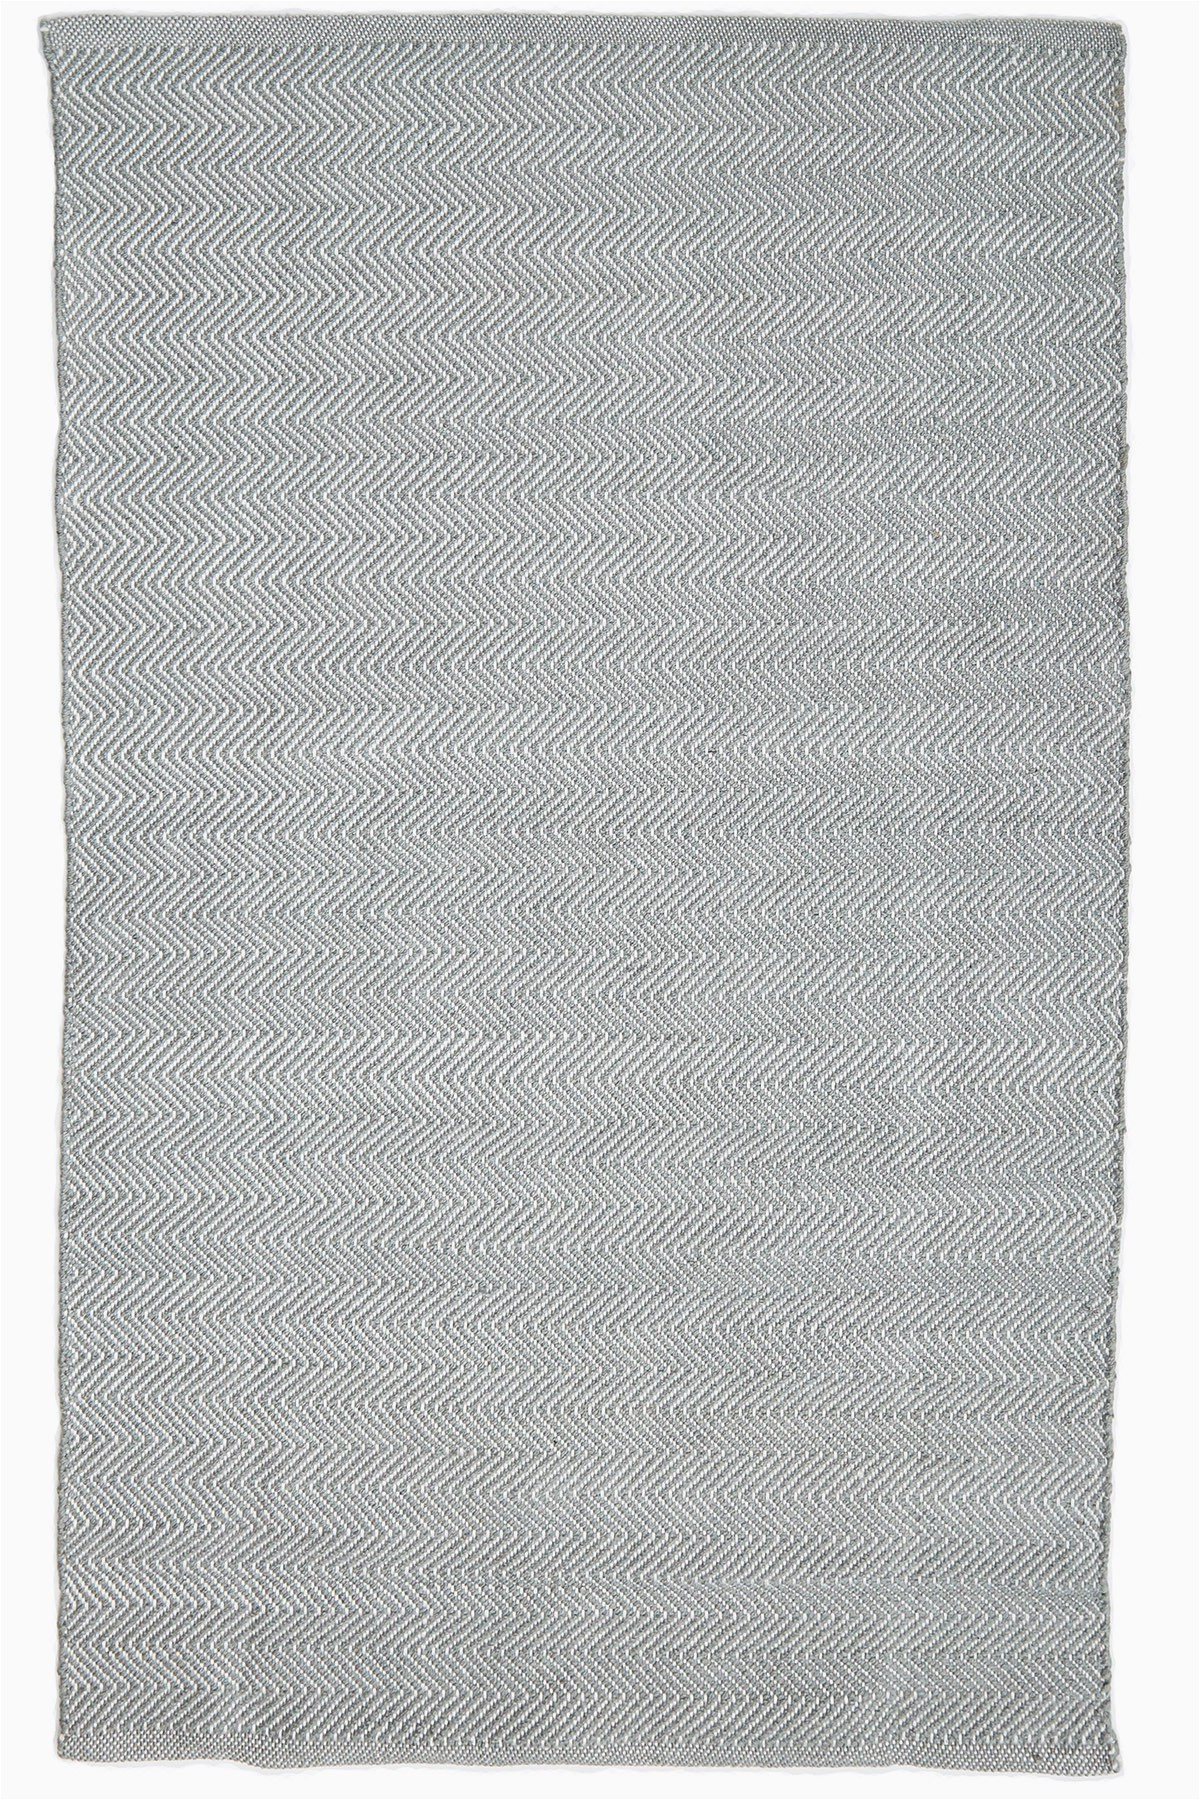 Navy Blue Herringbone Rug Herringbone Dove Grey